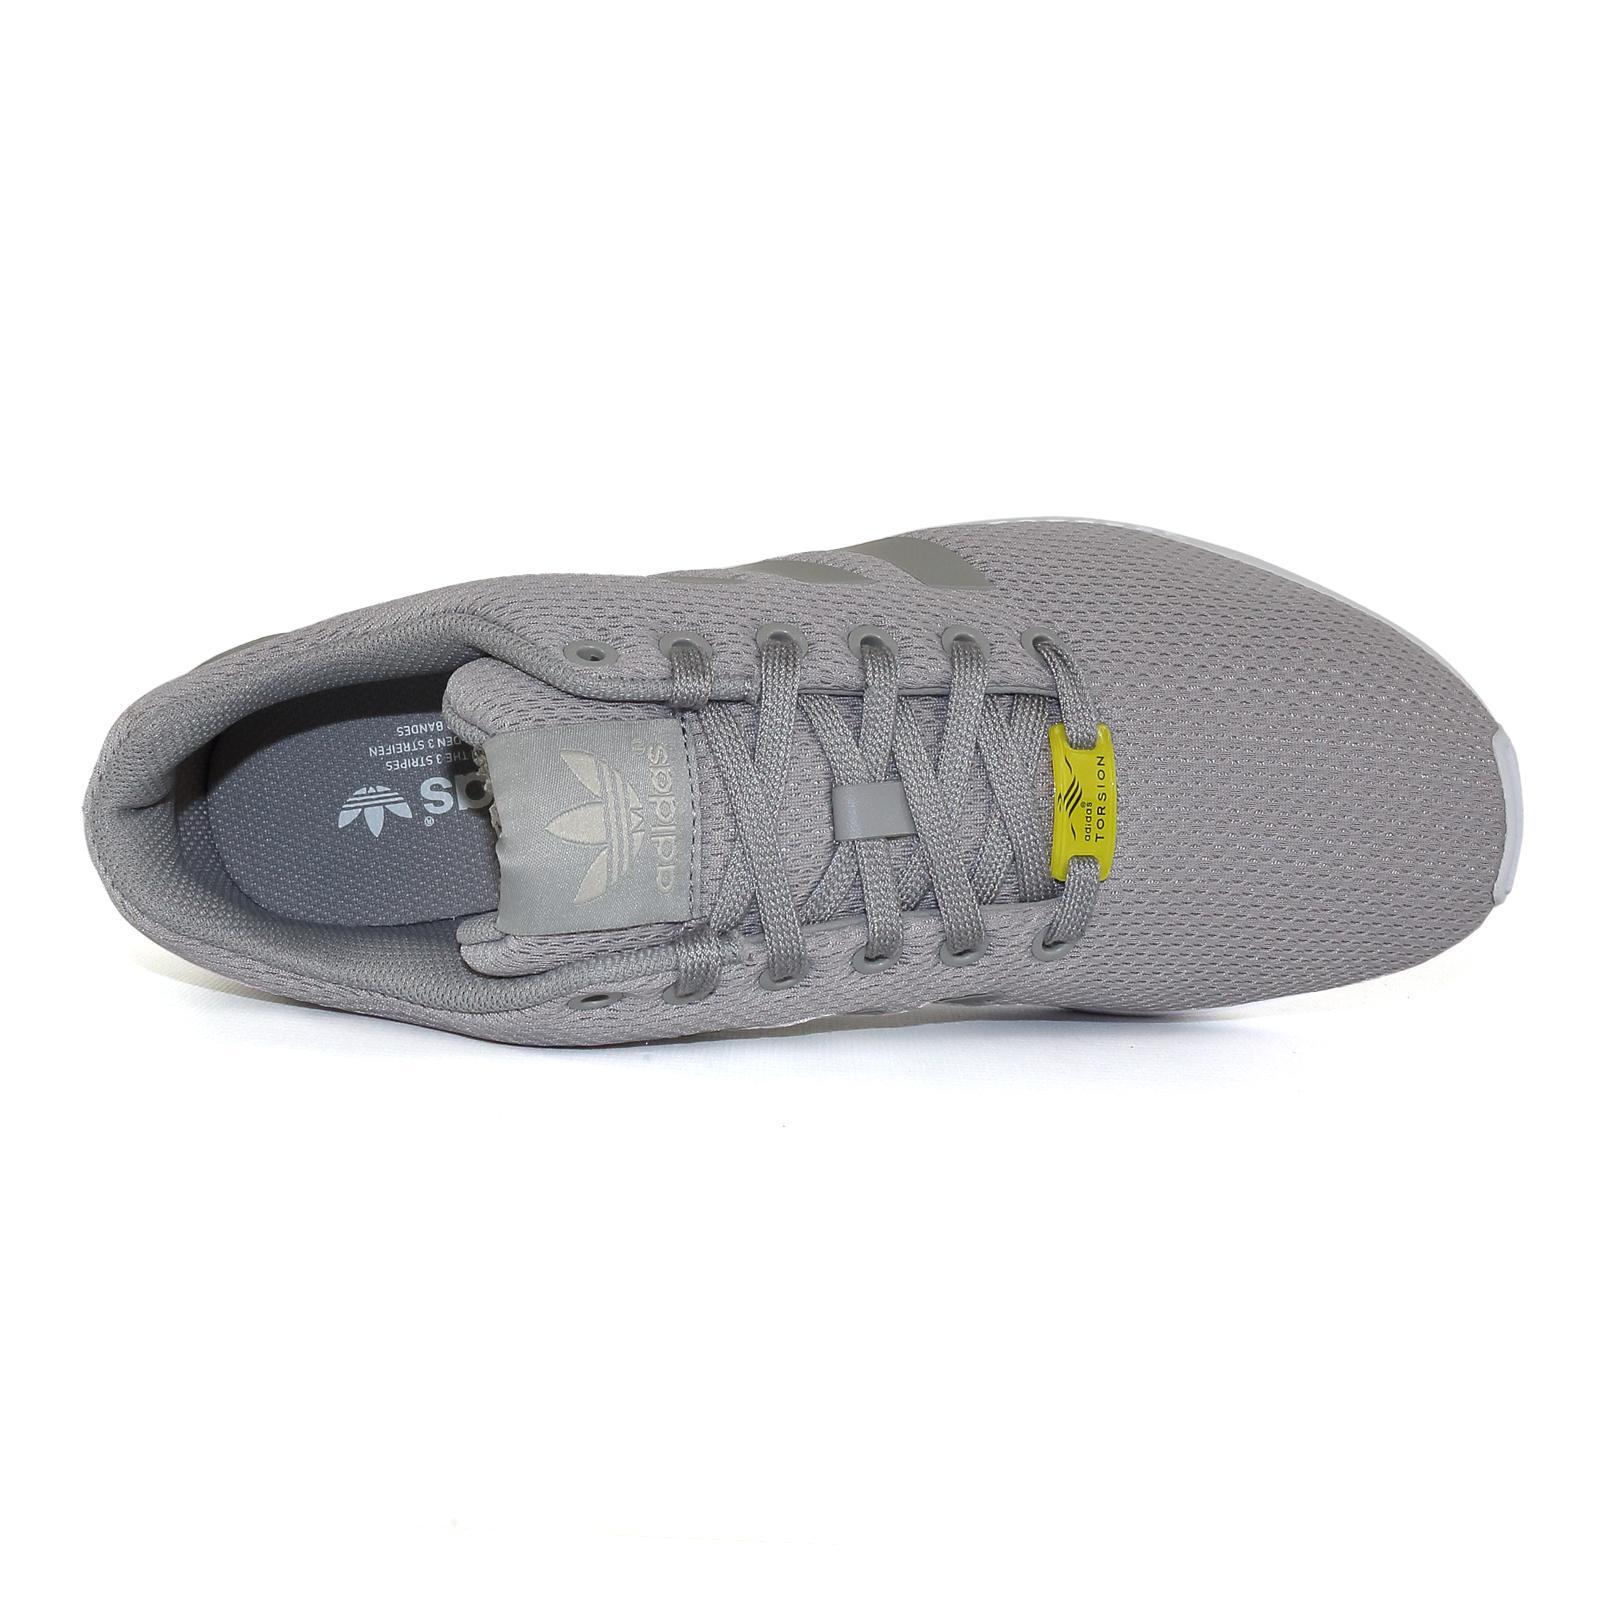 Adidas verschied. Flux Sneaker unisex Sportschuh, verschied. Adidas Farben, 50812 0aa8cf